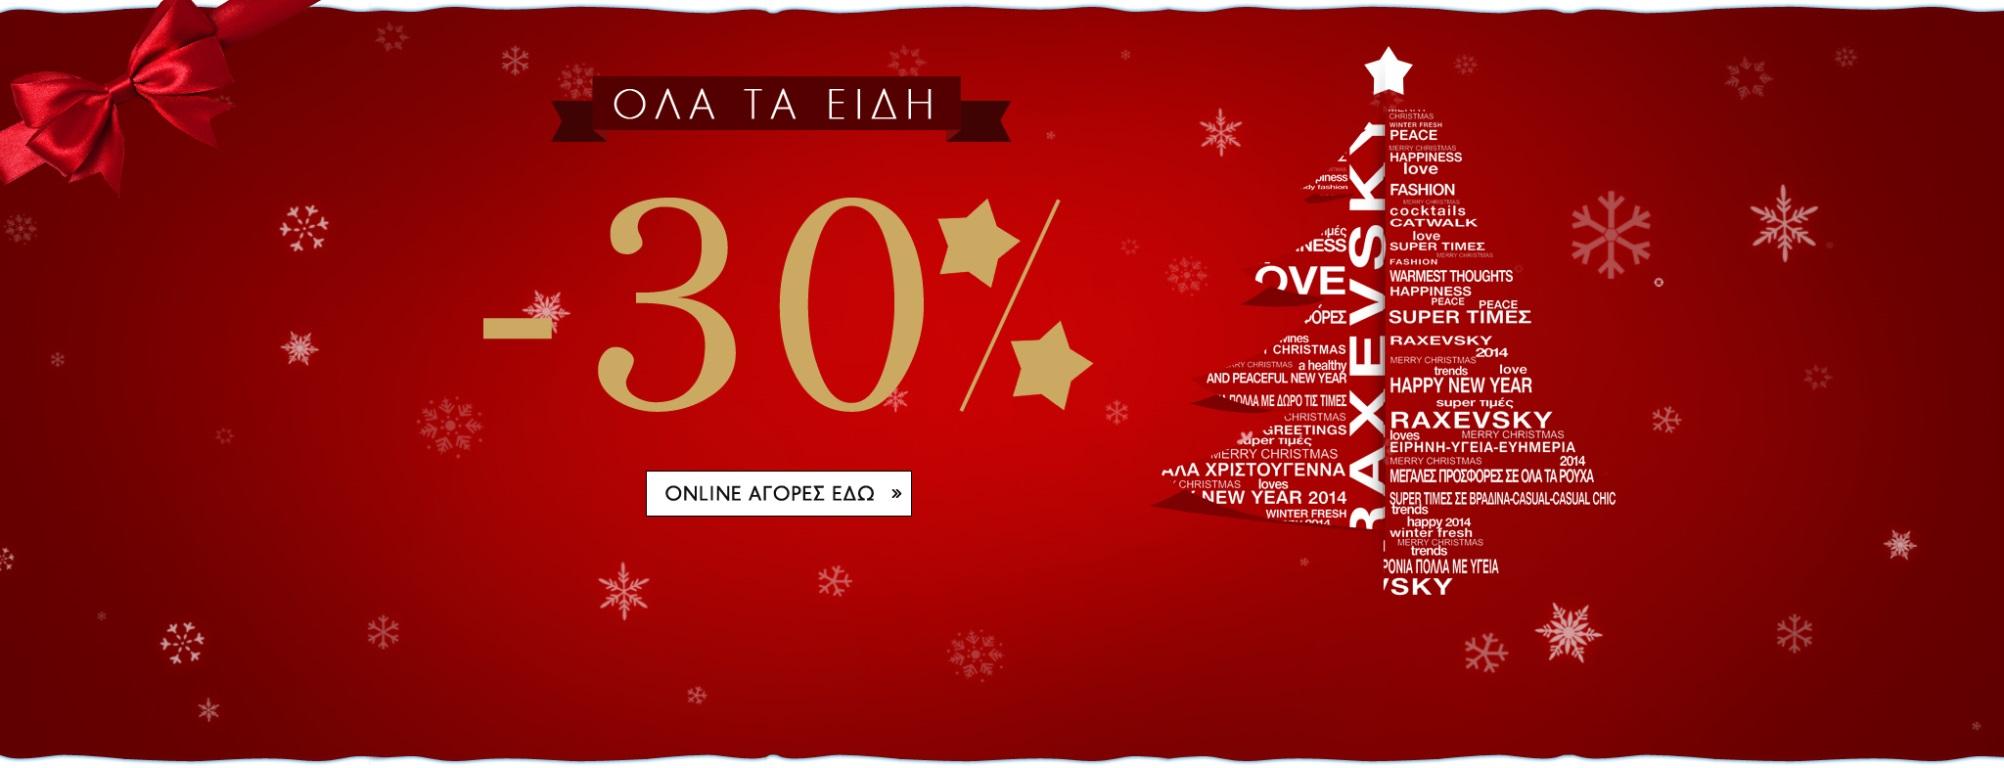 adbfe2601d48 Η Raxevsky σας εύχεται Χρόνια Πολλά με δώρο Pre-Christmas εκπτώσεις. Η  αγαπημένη σας εταιρεία ρούχων σας χαρίζει το -30% σε όλα τα ρούχα Raxevsky–  Zeta ...